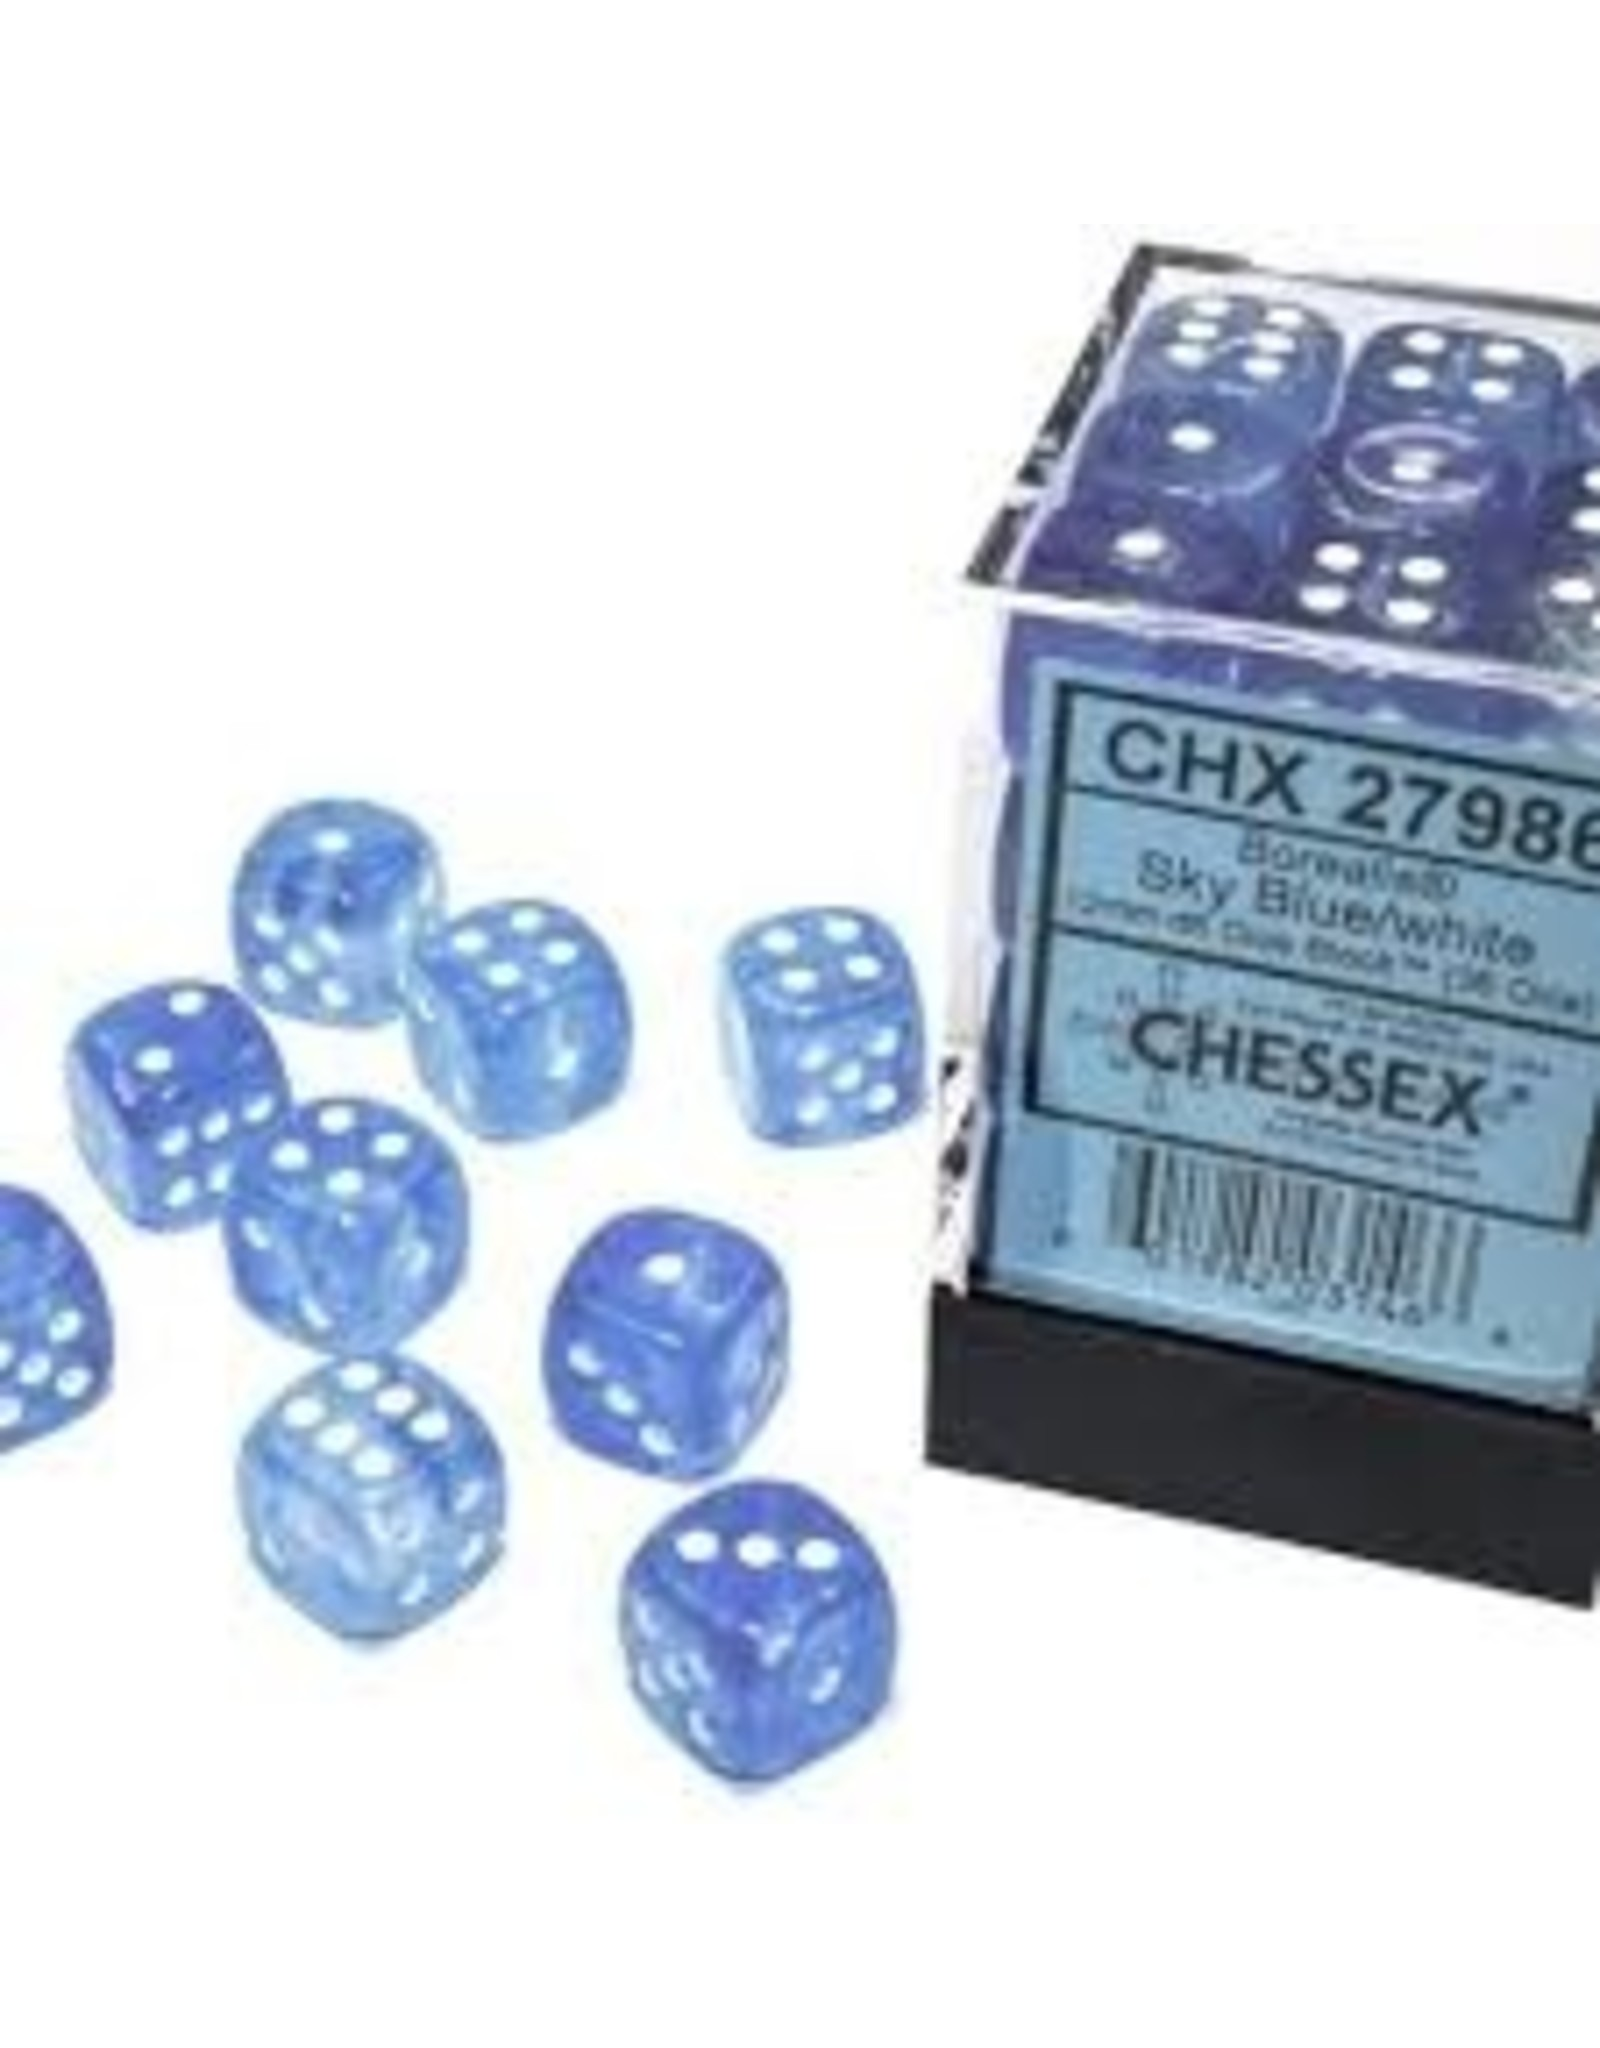 Chessex d6Cube12mm Borealis Luminary SBUwh (36)